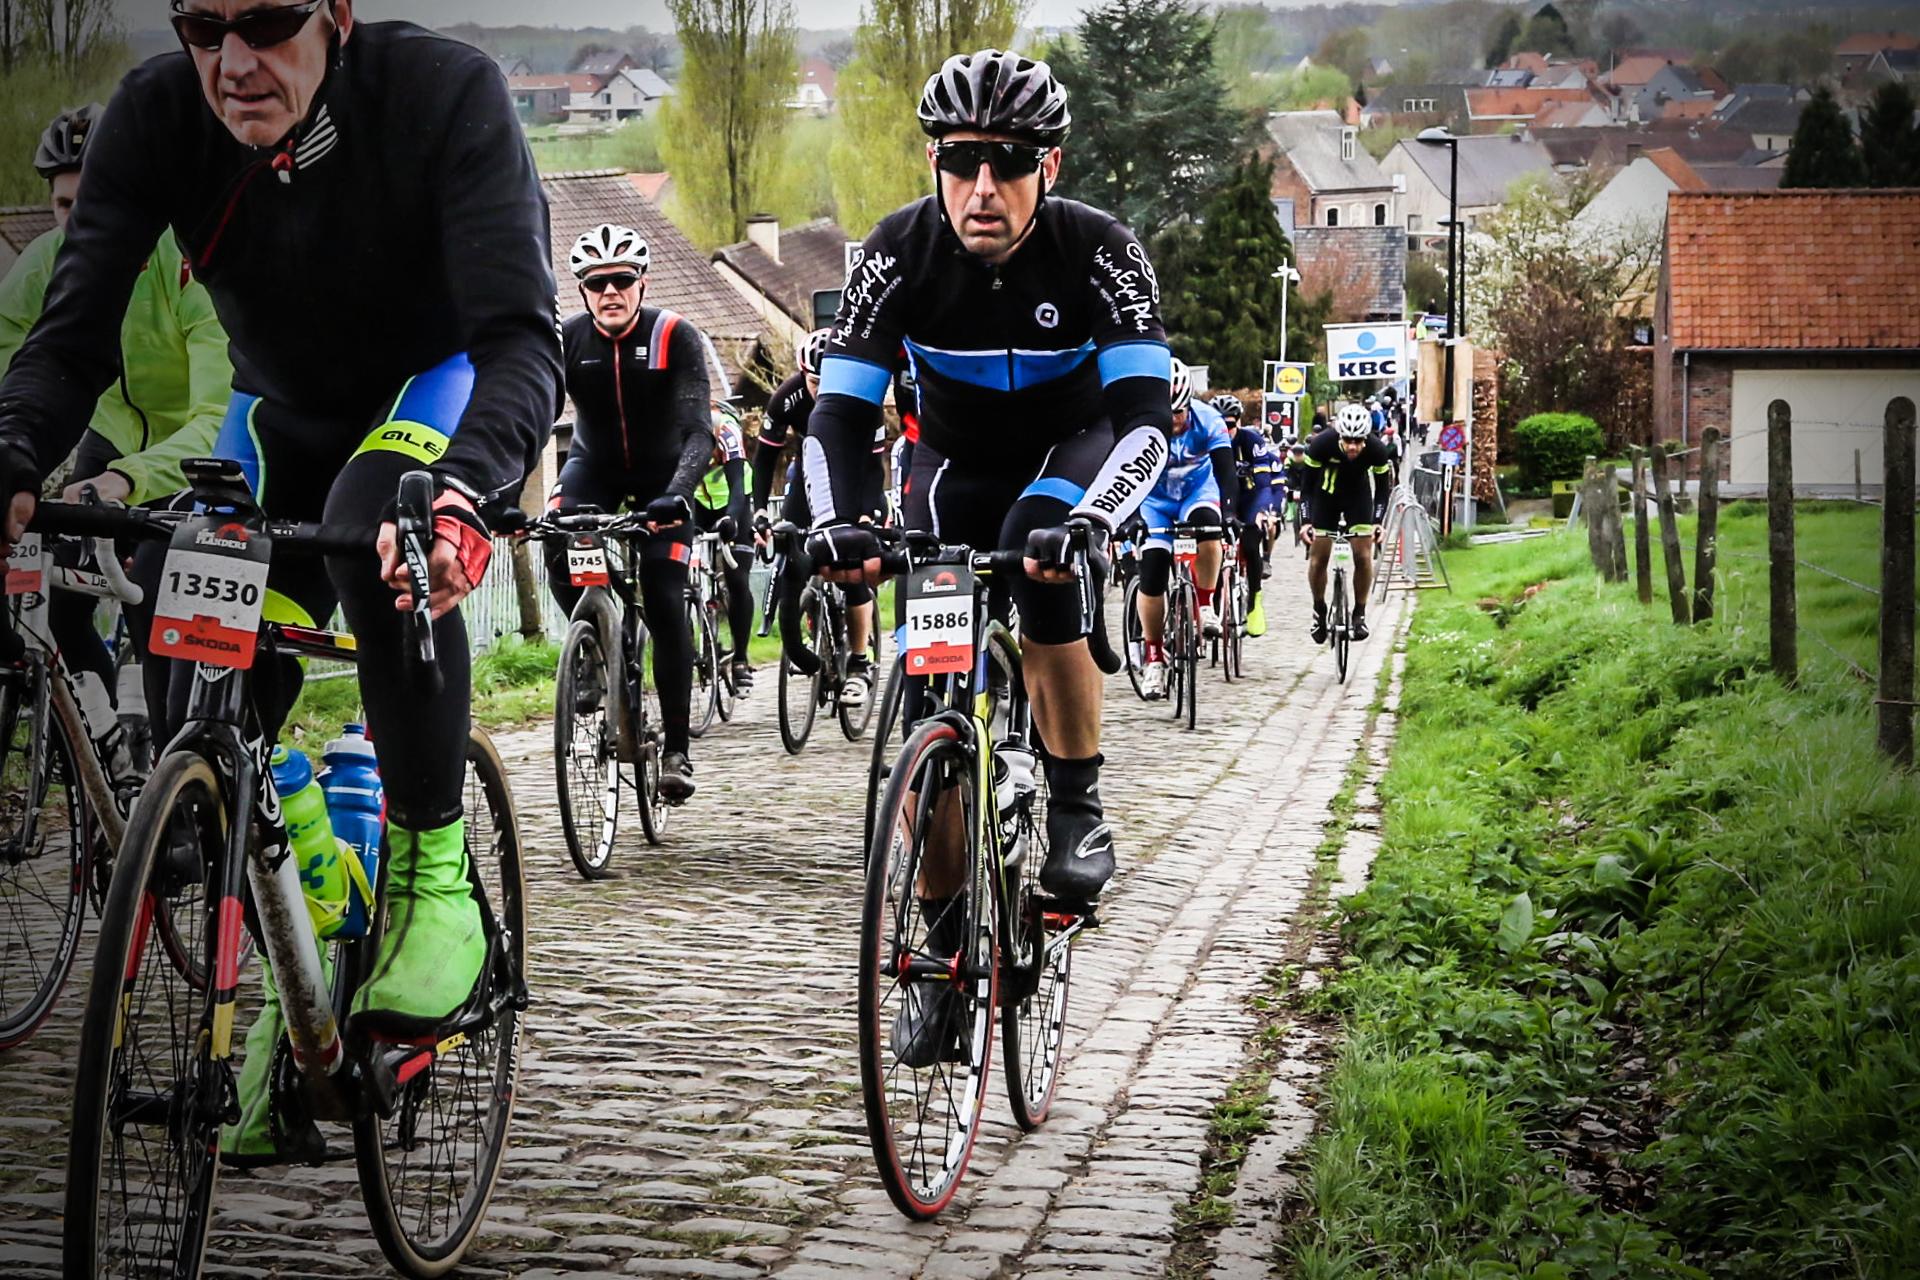 Pascal Garnier, Tour des flandres 2017 - Crédits photo : Sportograf